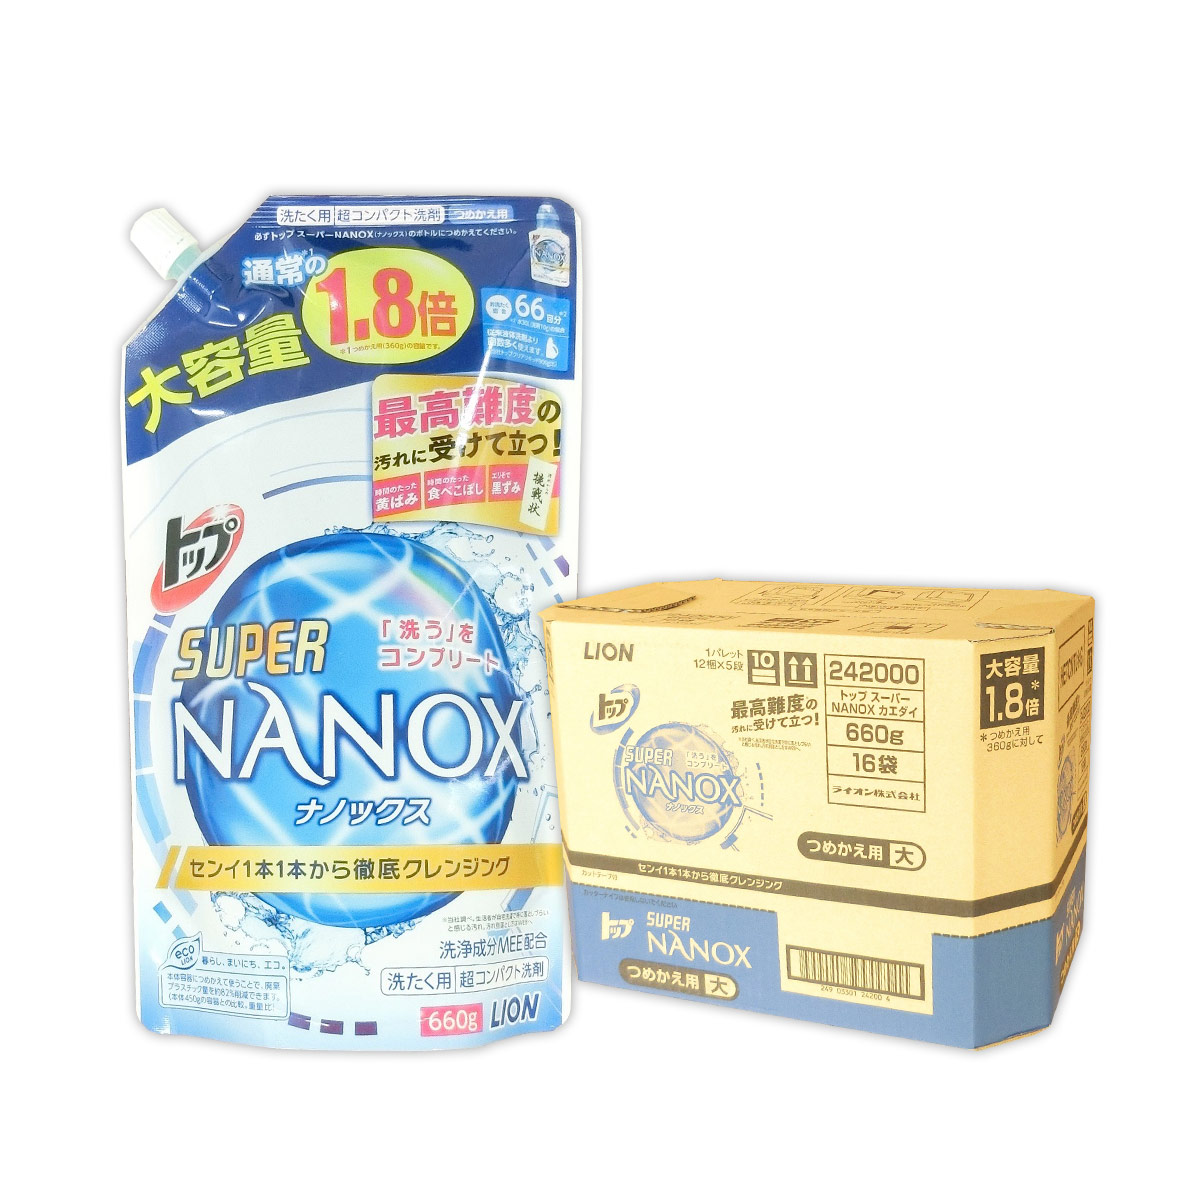 SUPER NANOX つめかえ用 大 660g × 16パック 【ライオン LION】【242000 tmp】